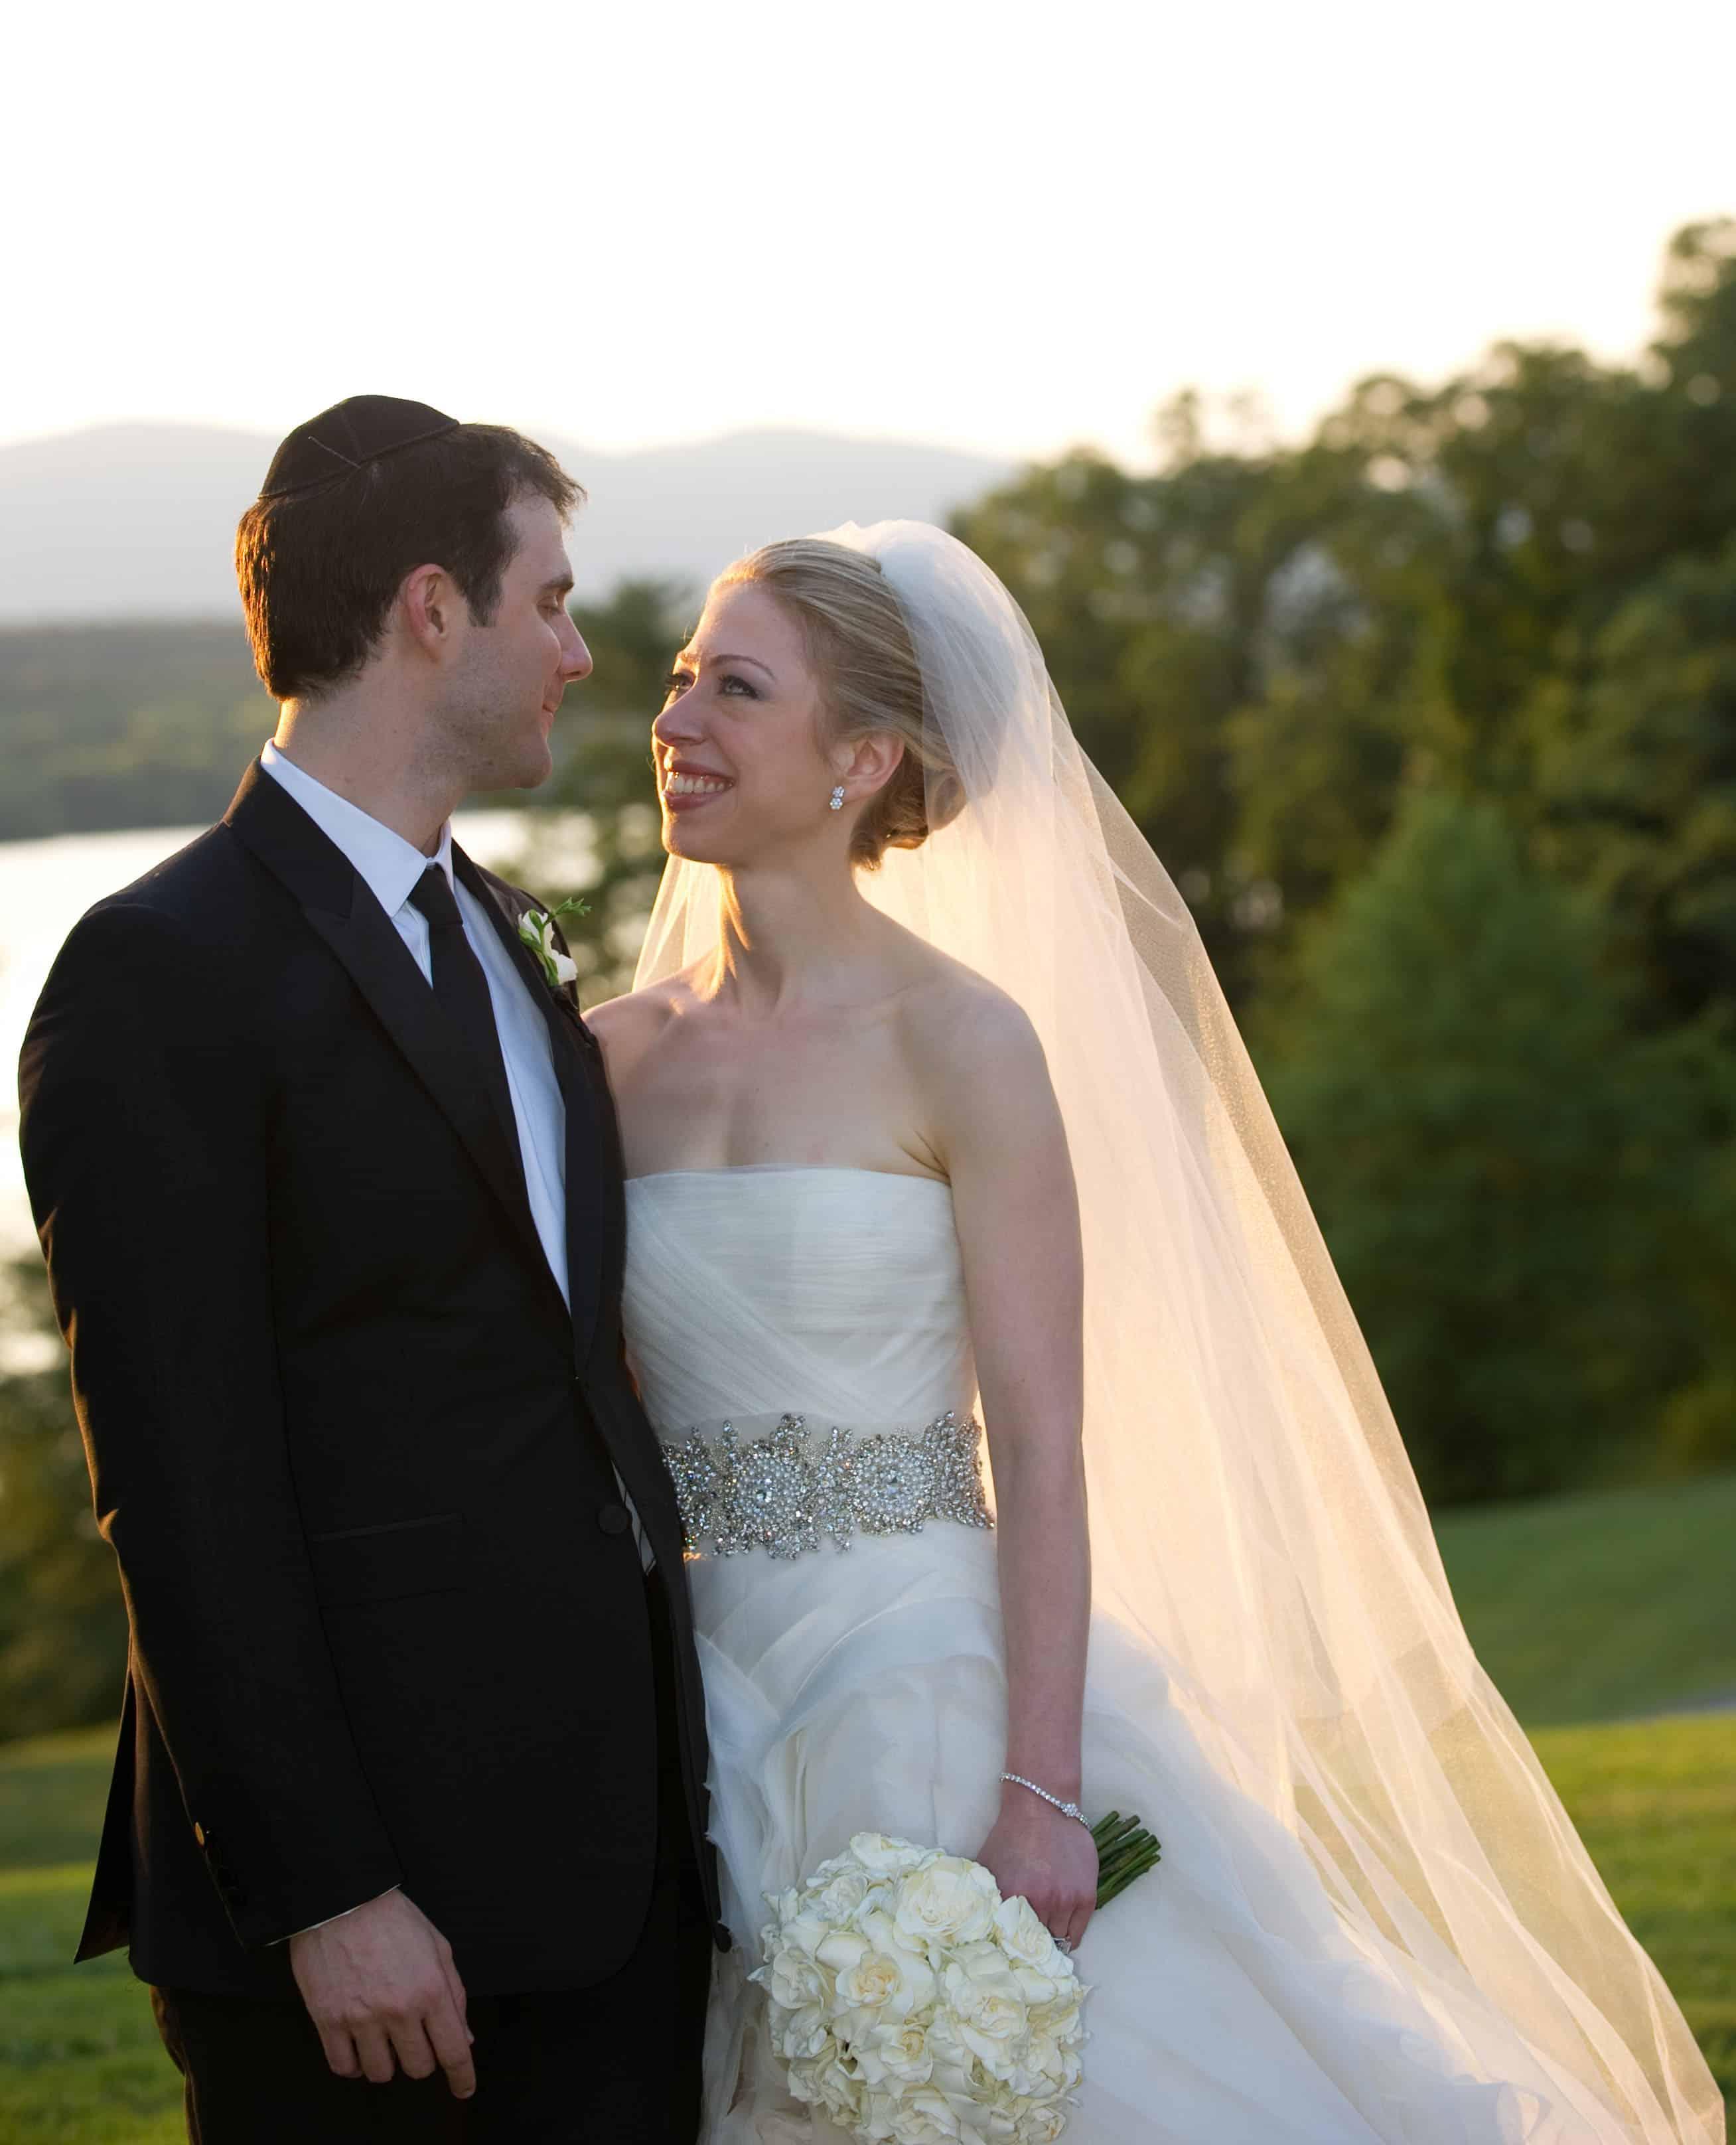 Trouble In Paradise For Chelsea Clinton & Marc Mezvinsky